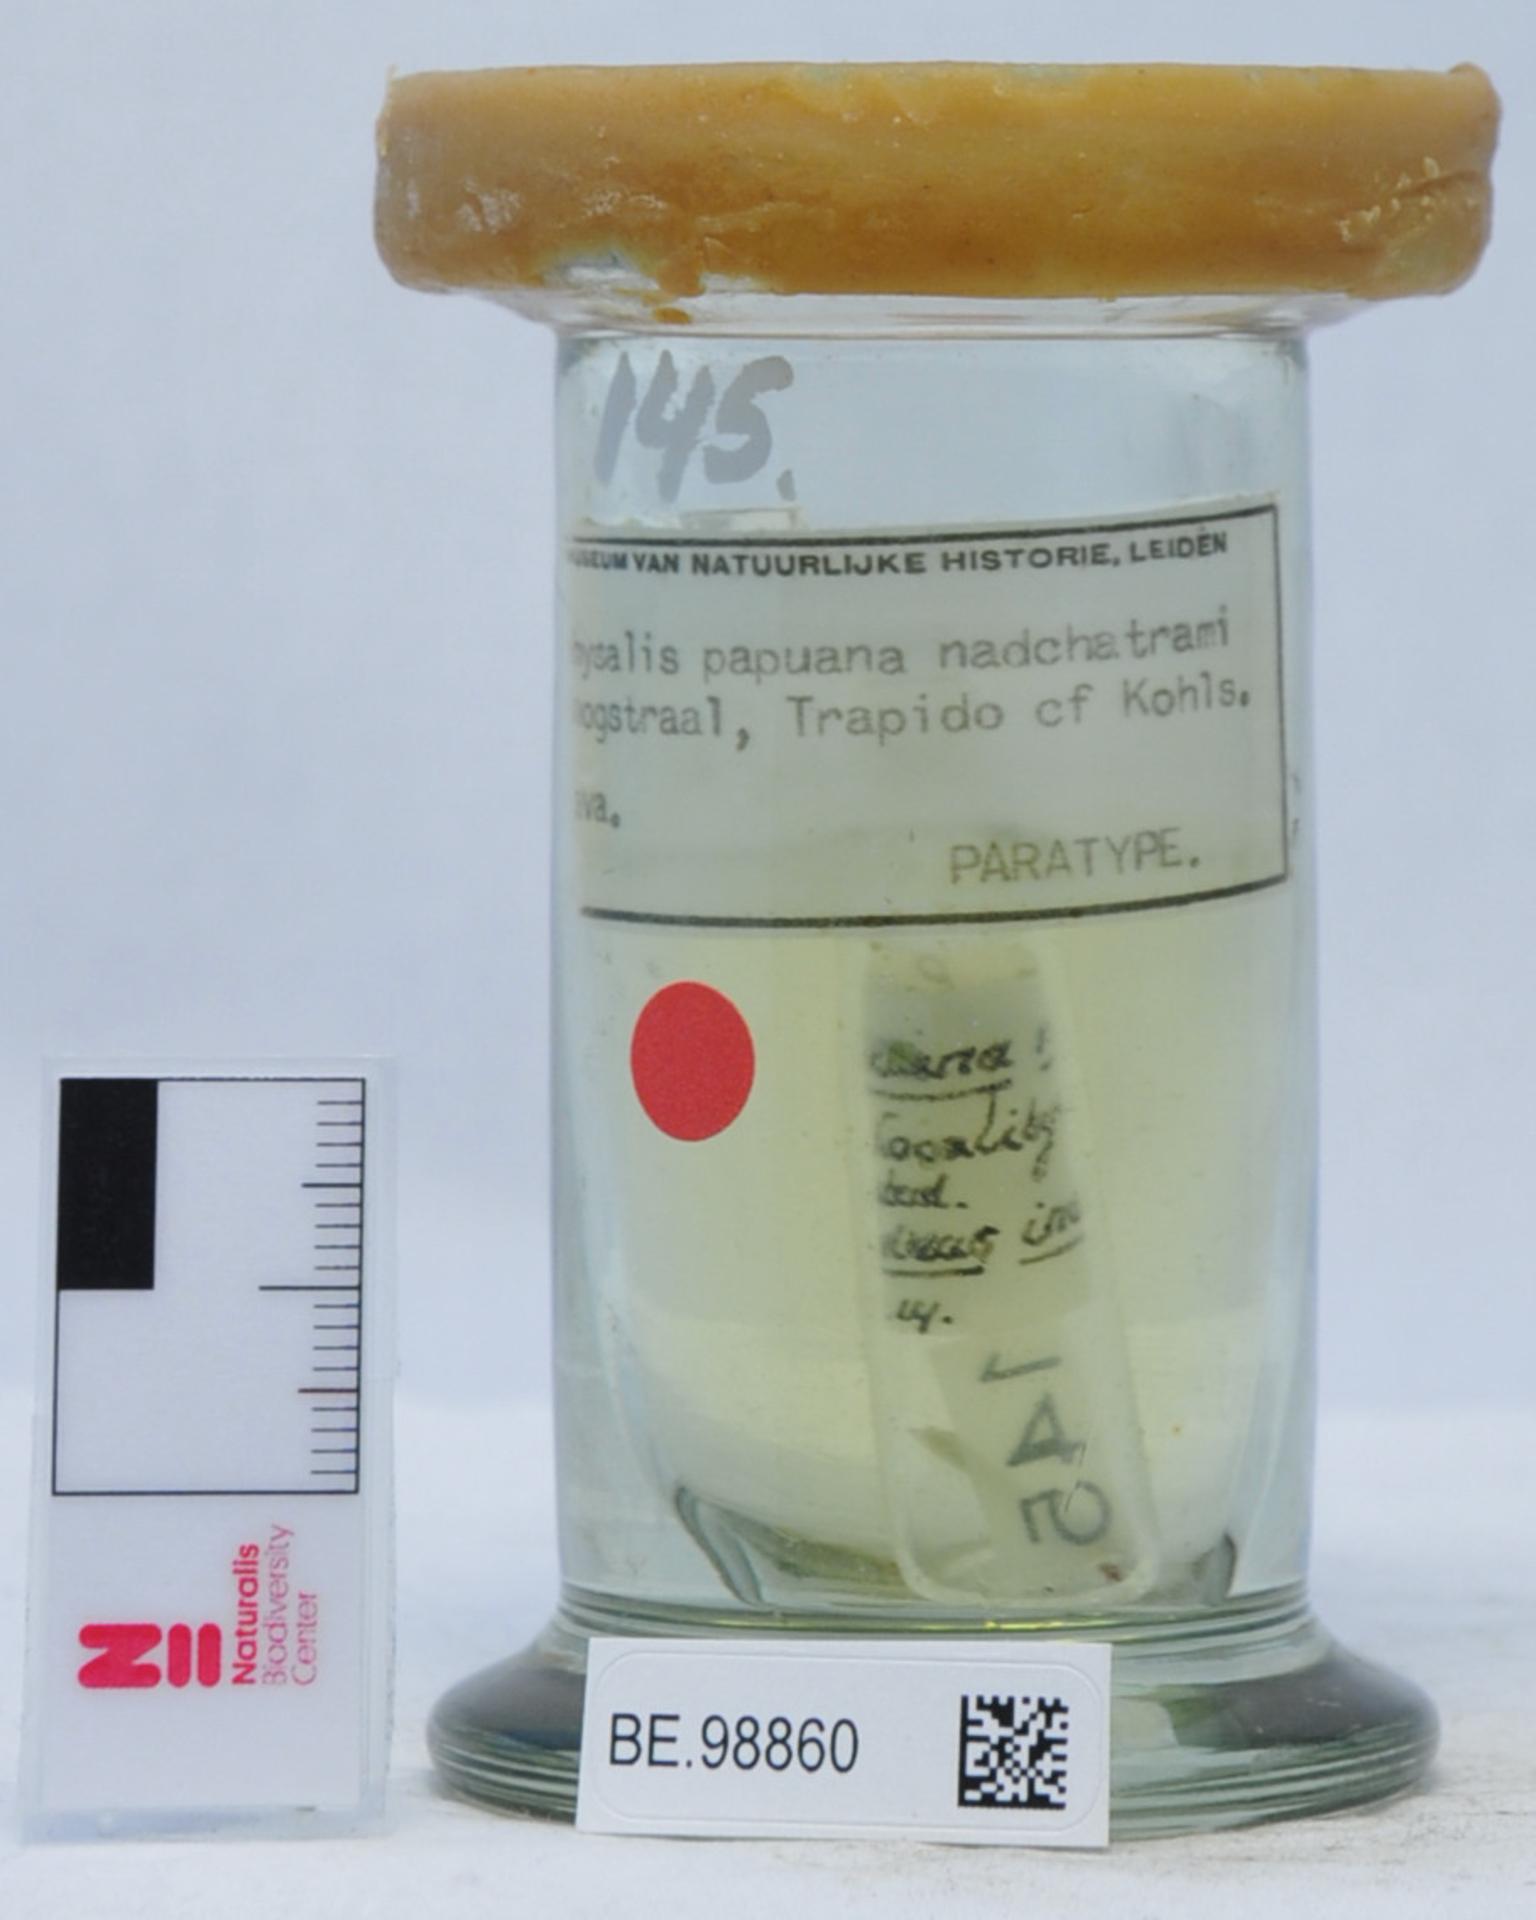 RMNH.ACA.145   Haemaphysalis papuana nadchatrami Hoogstraal, Trapido & Kohls, 1965